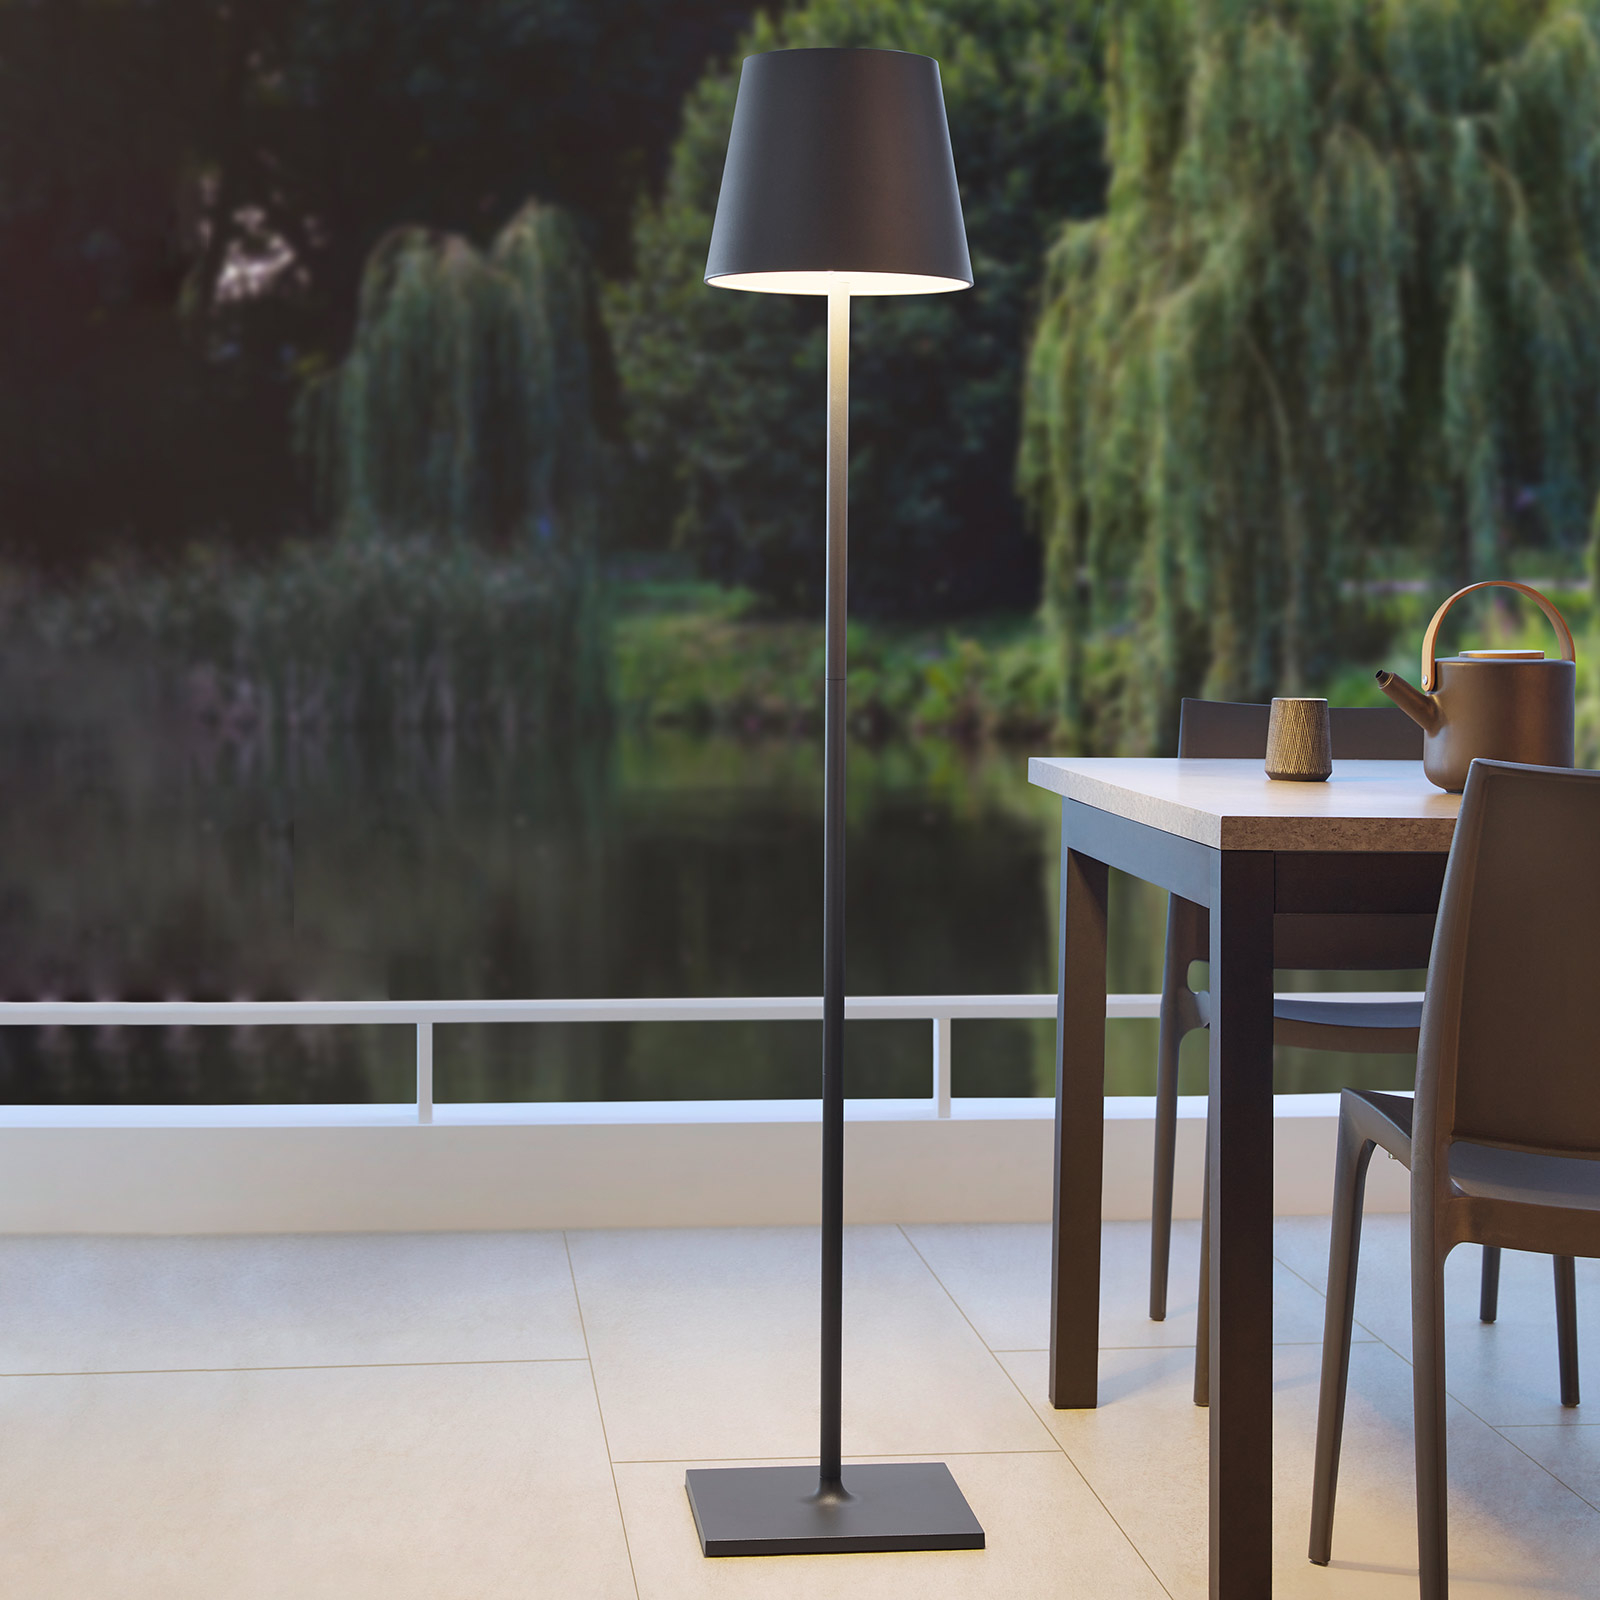 Quint Outdoor LED-gulvlampe, trådløs, antracit